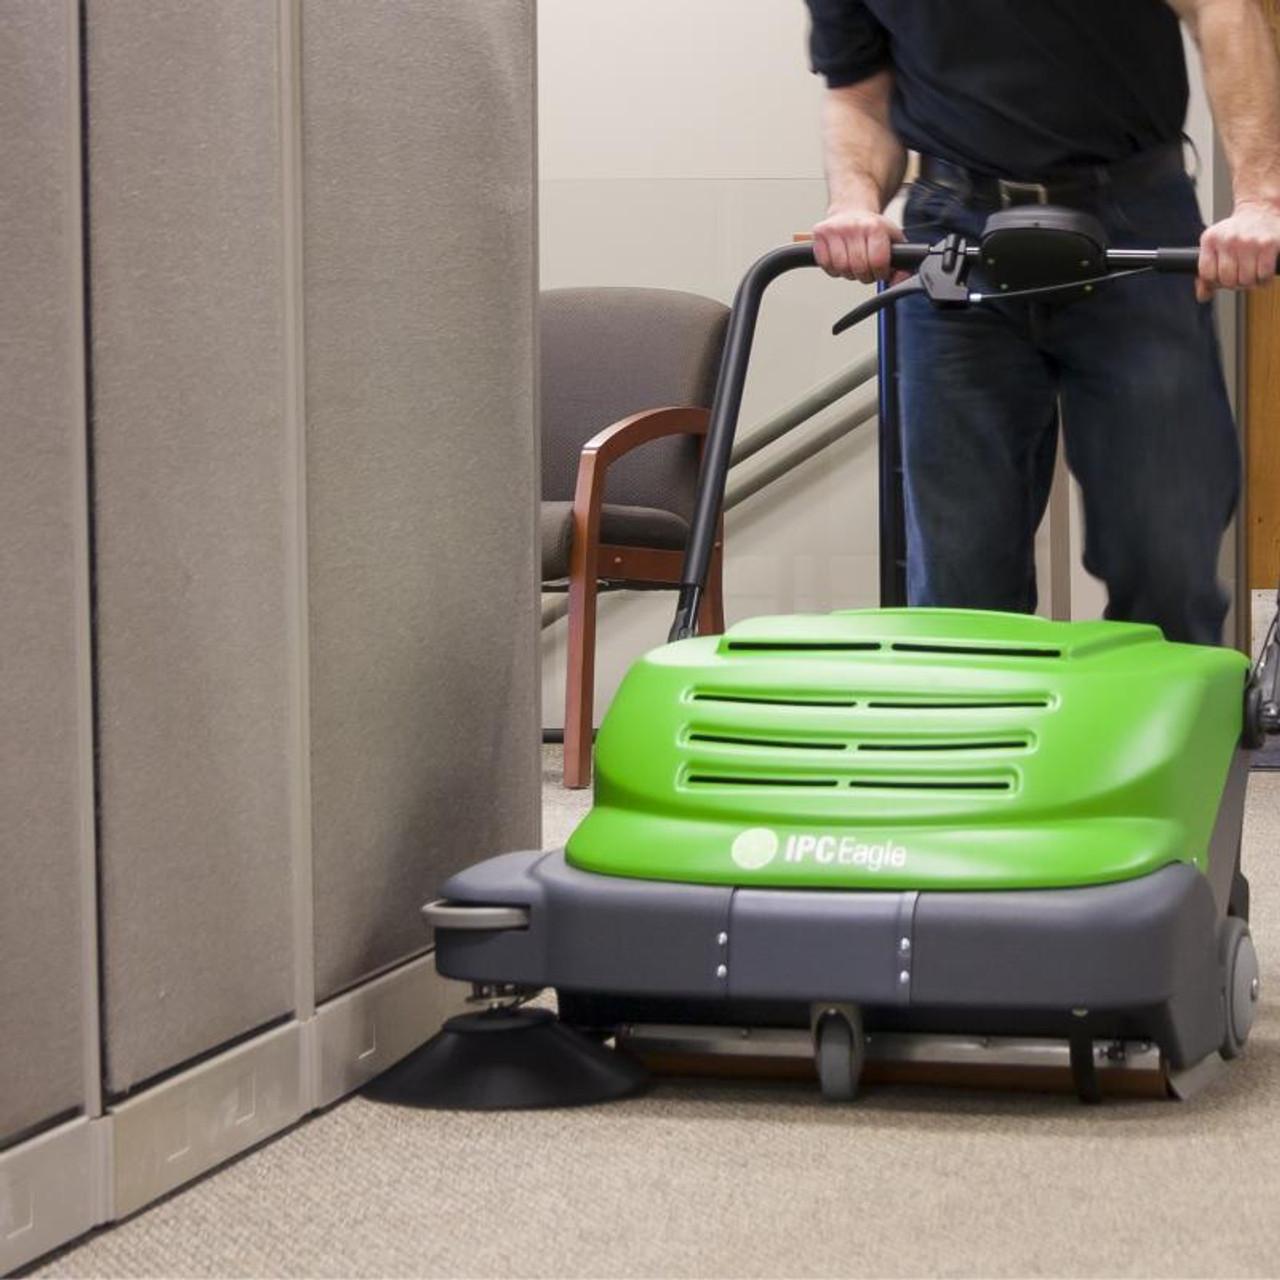 SmartVac 664 cleans along baseboards